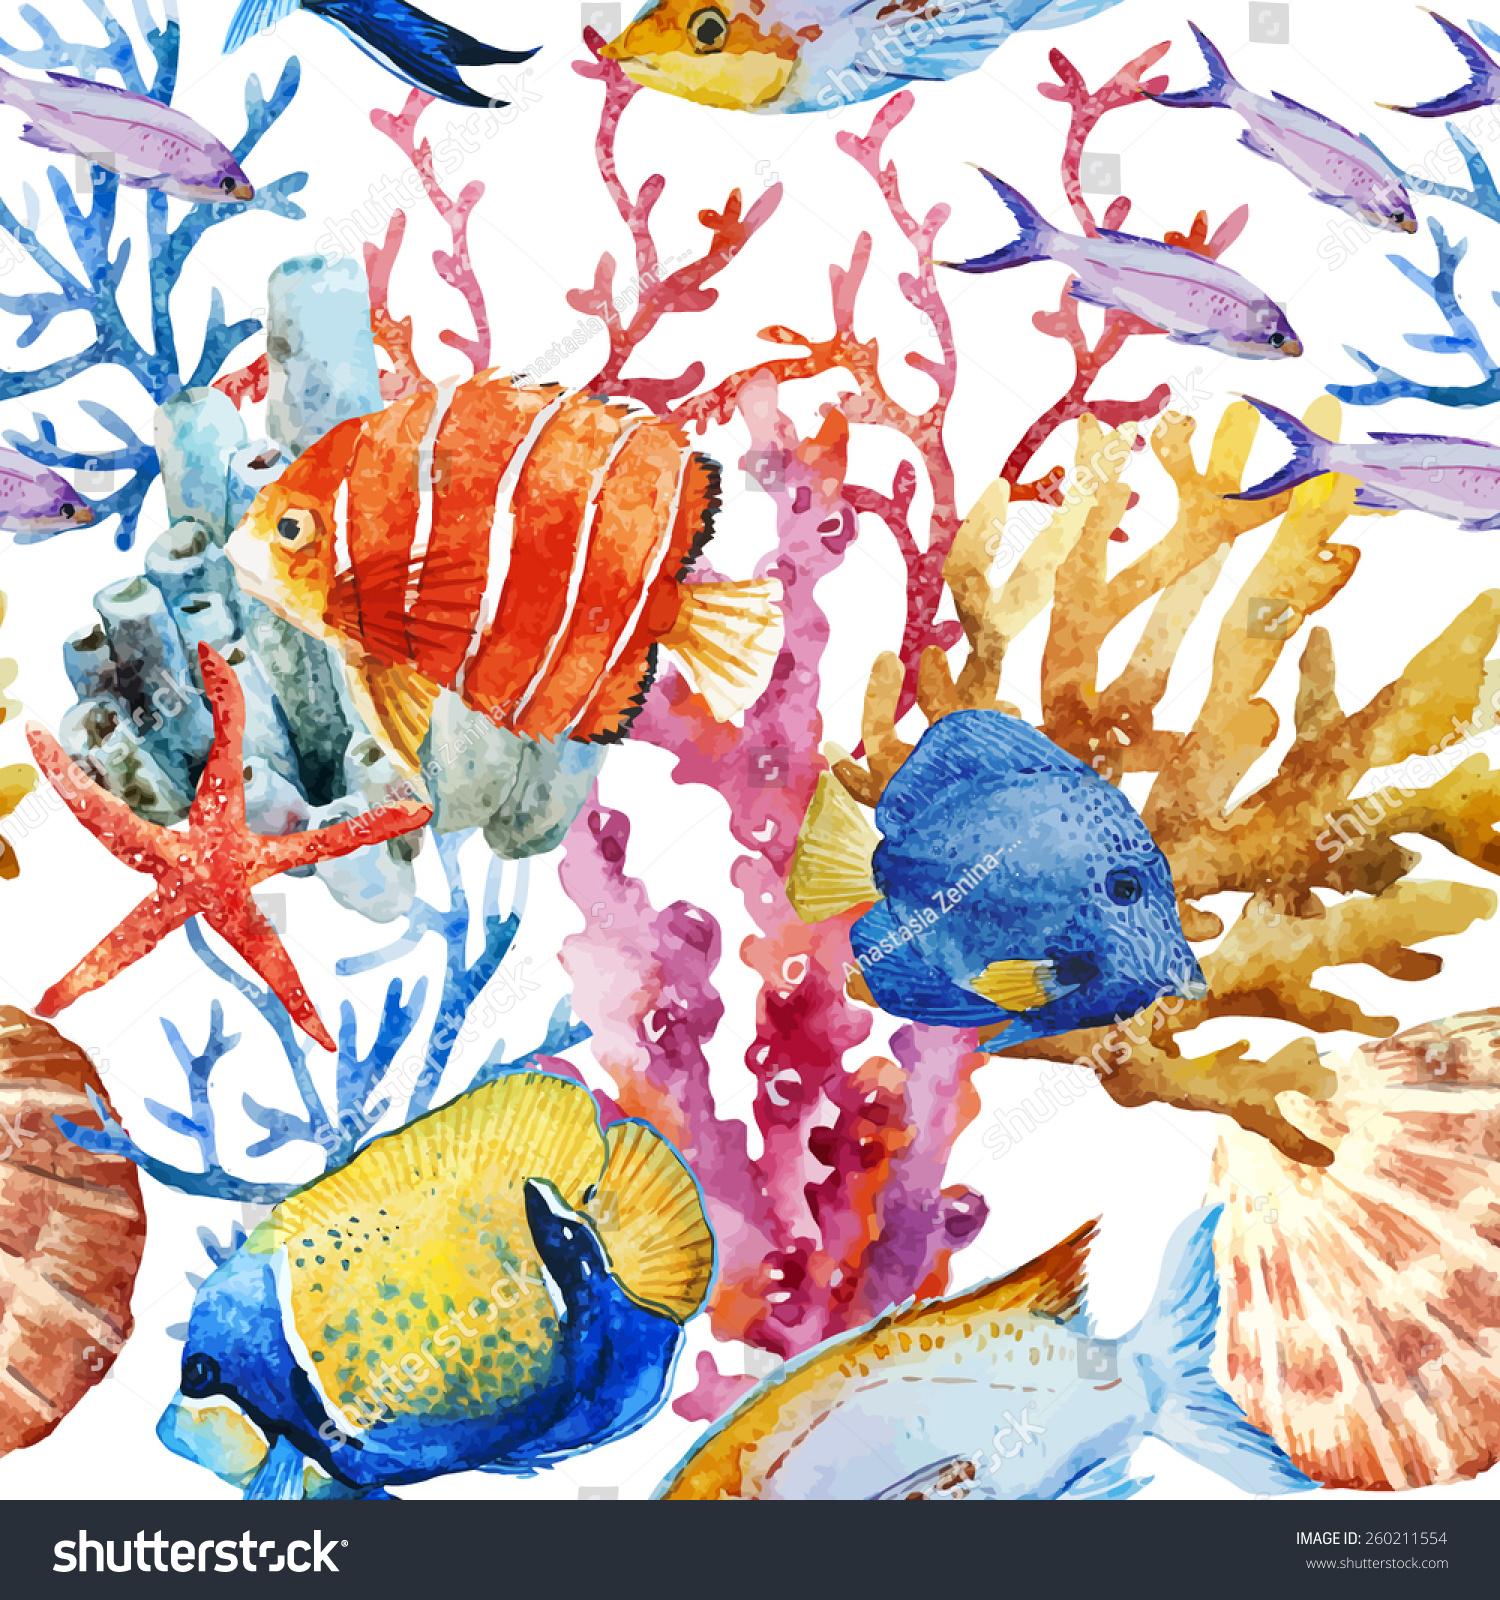 ocean fish wallpaper pattern - photo #3